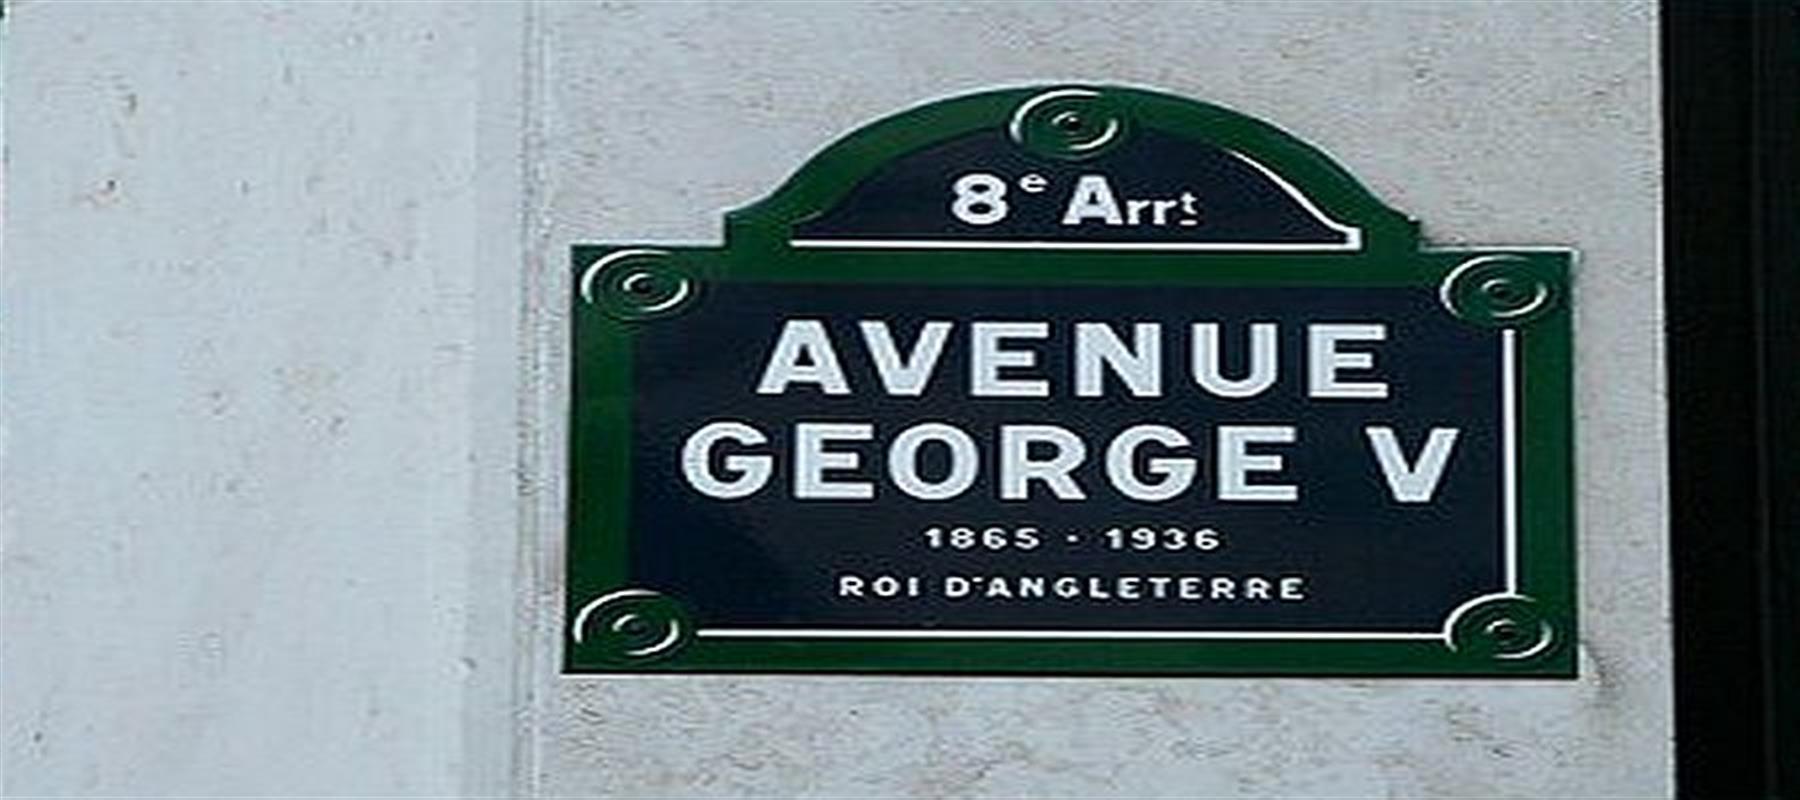 Hotel proche avenue george v paris h tel france eiffel - Hotel georges v paris prix chambre ...